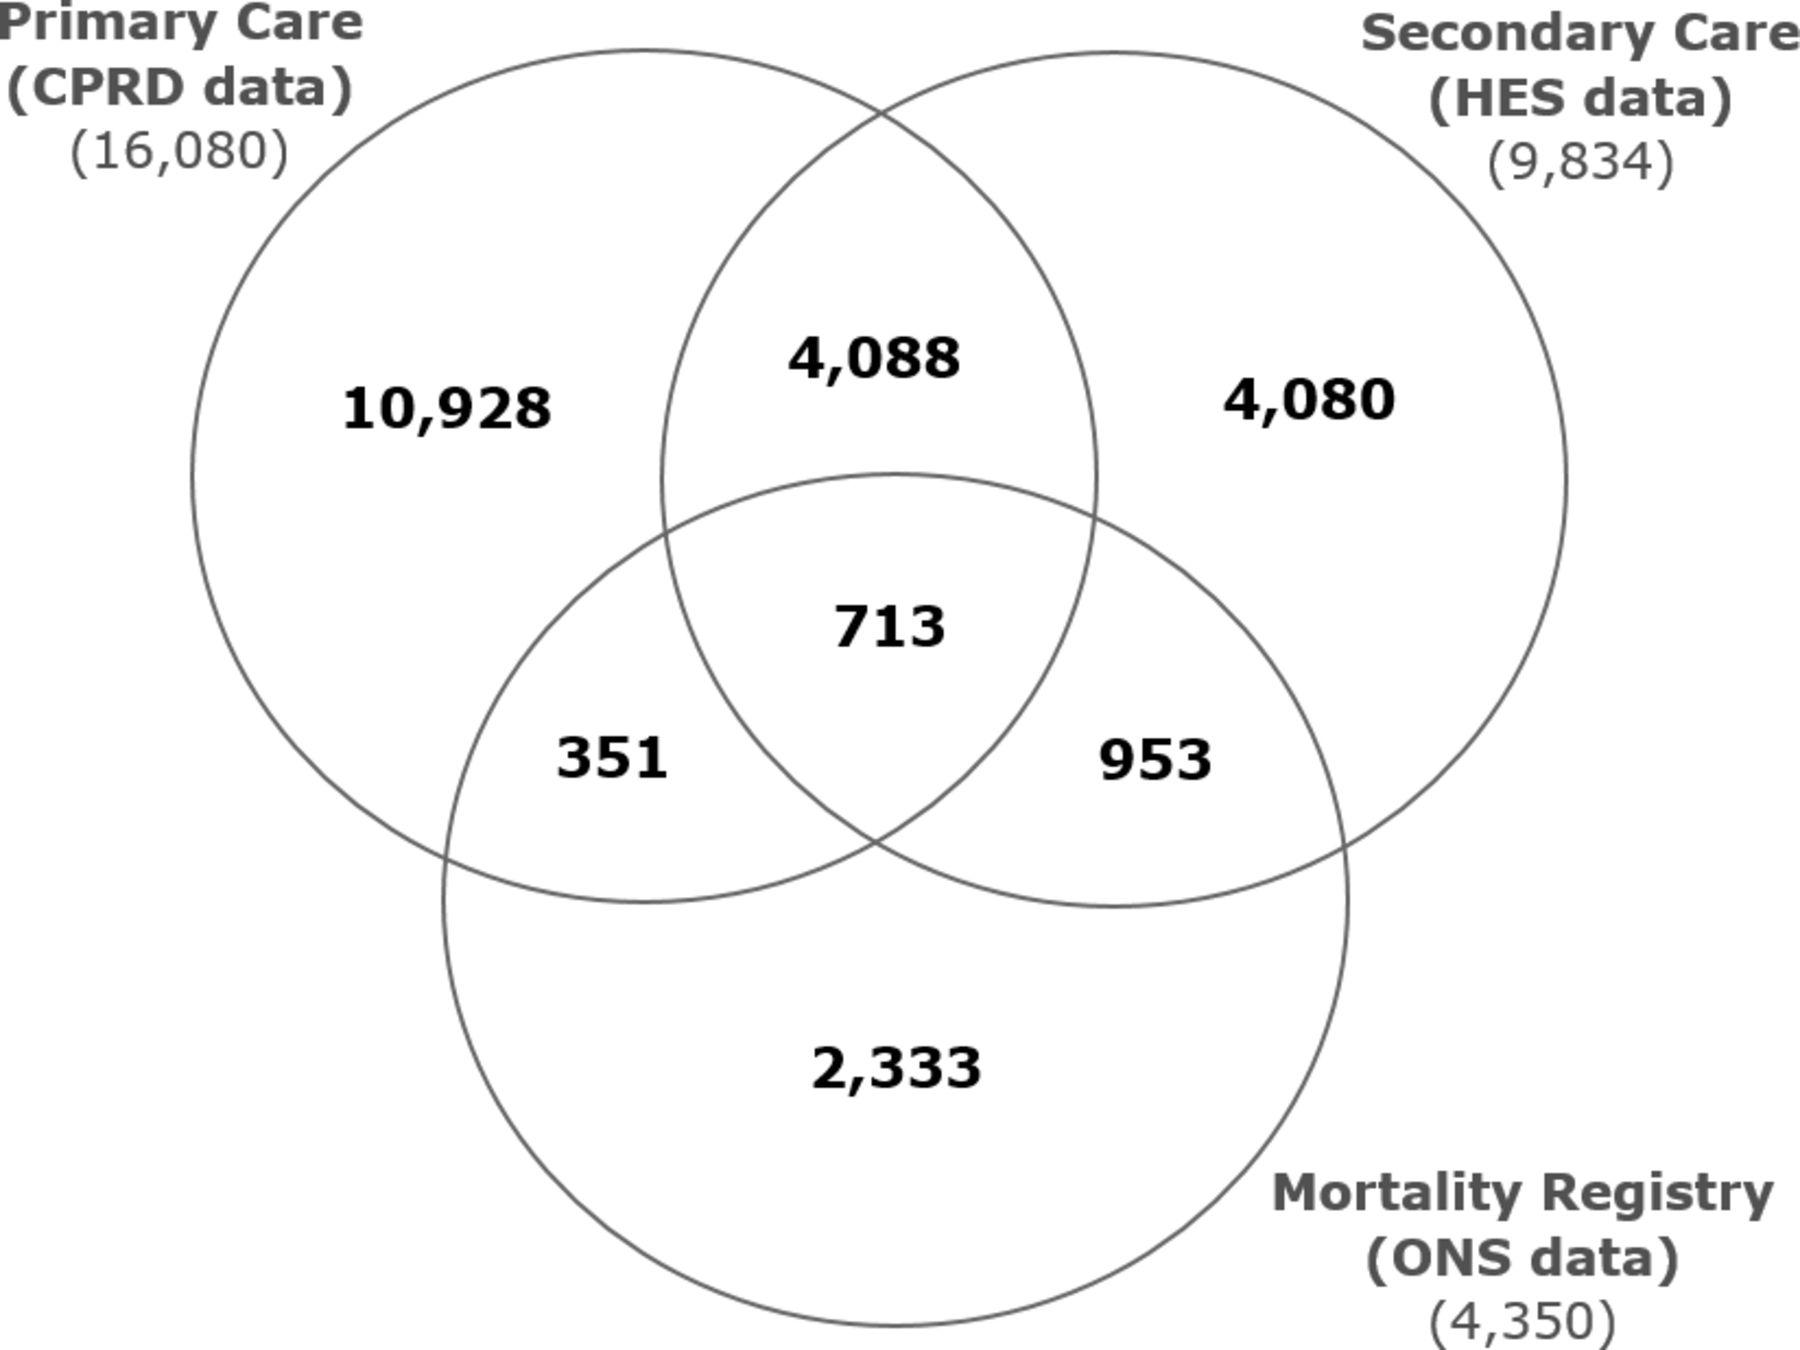 Sub-optimal cholesterol response to initiation of statins